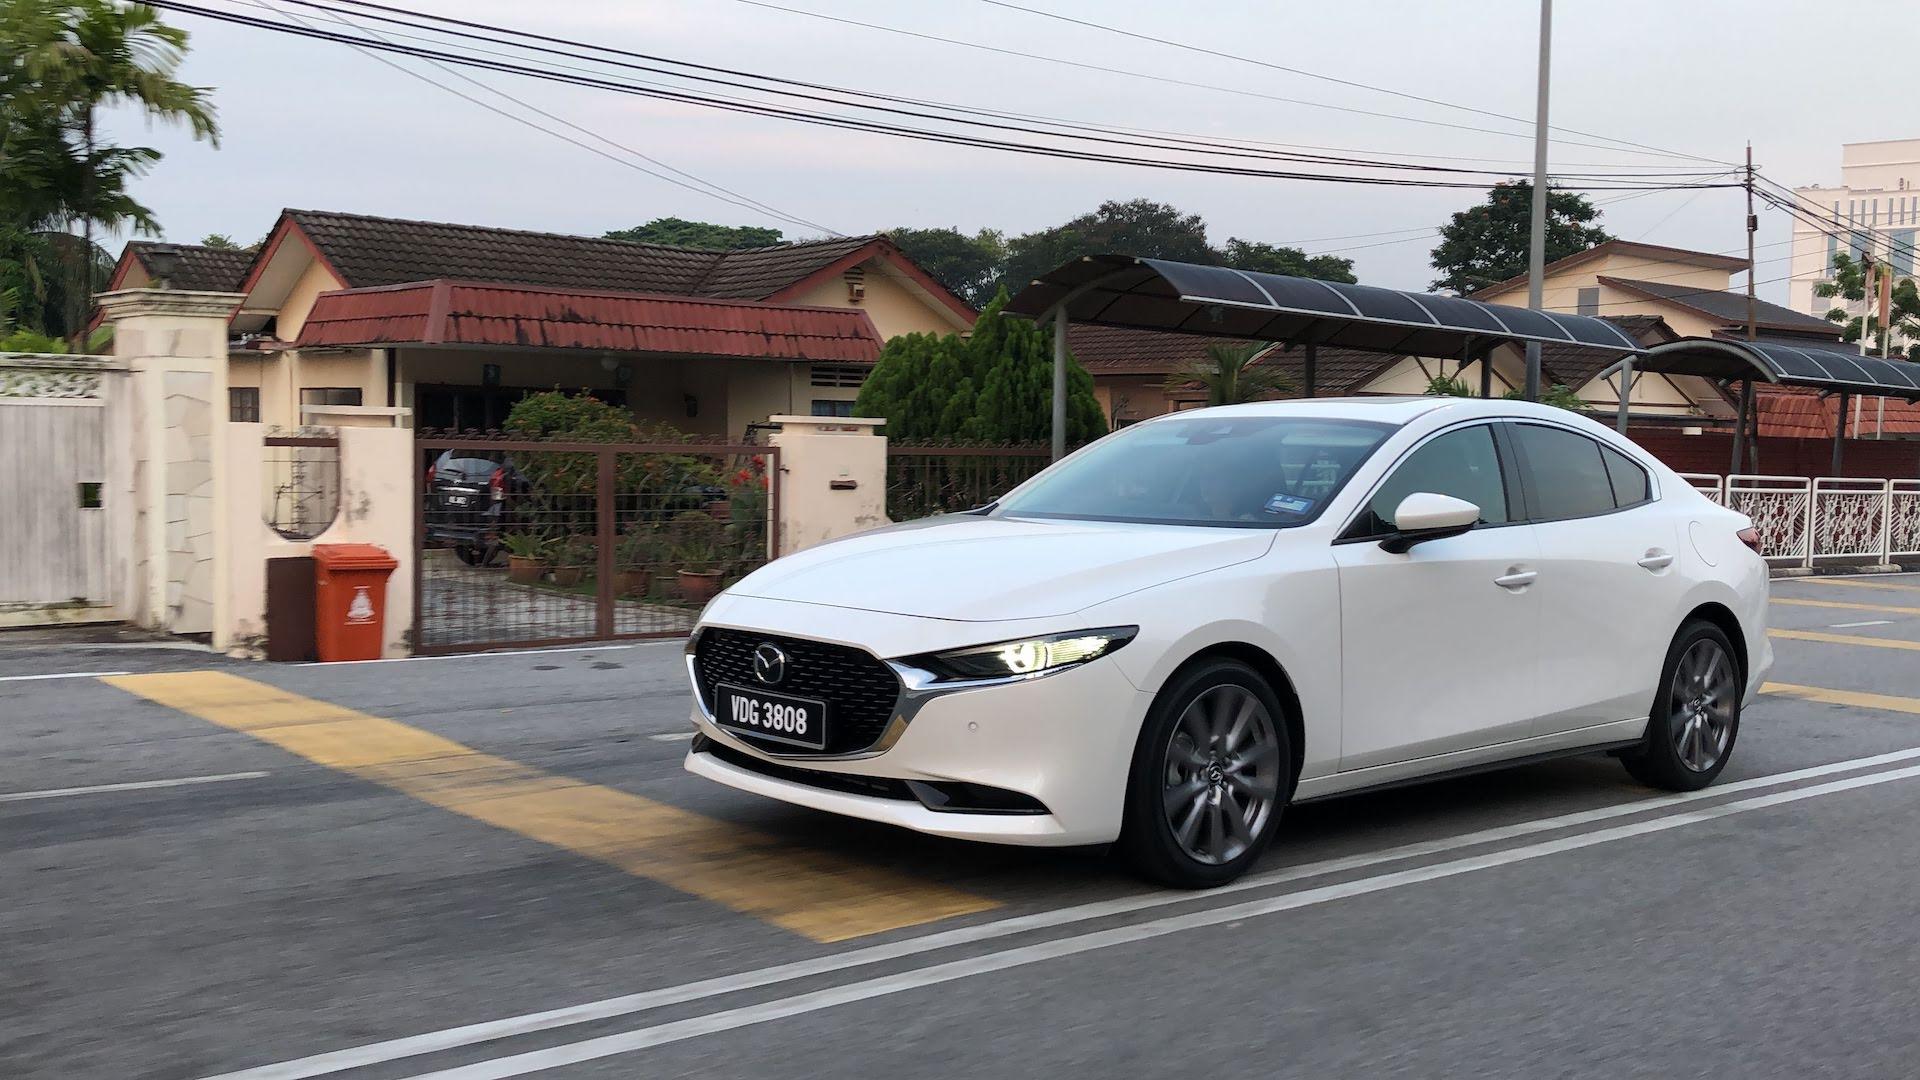 Mazda3 Skyactiv G 2019 Review Free Malaysia Today